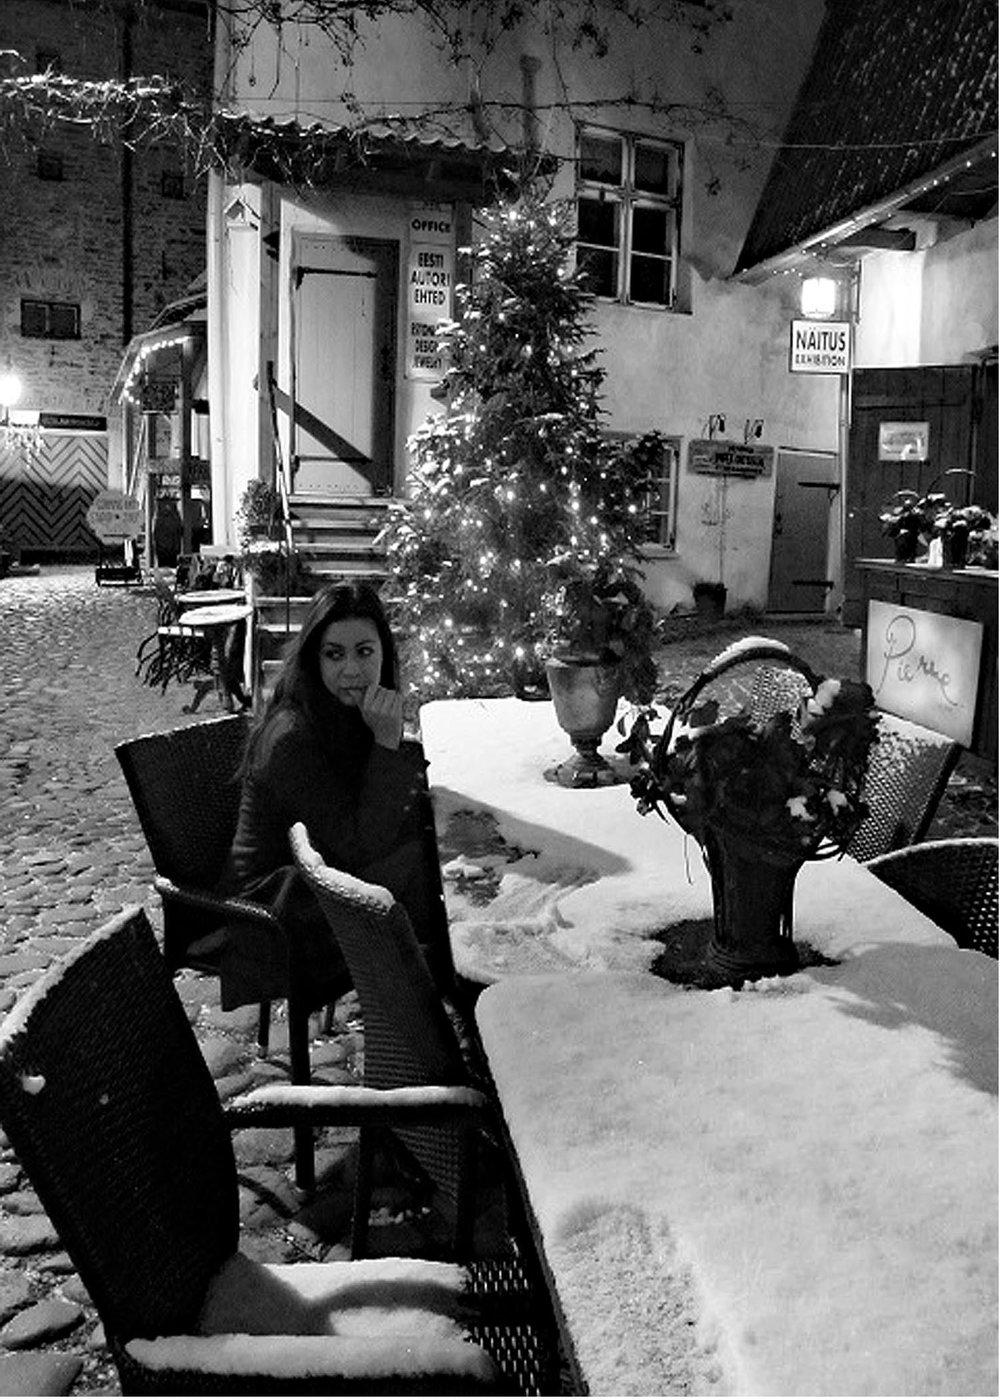 Snow_Banquet_Tallinn_Estonia_B_W.jpg